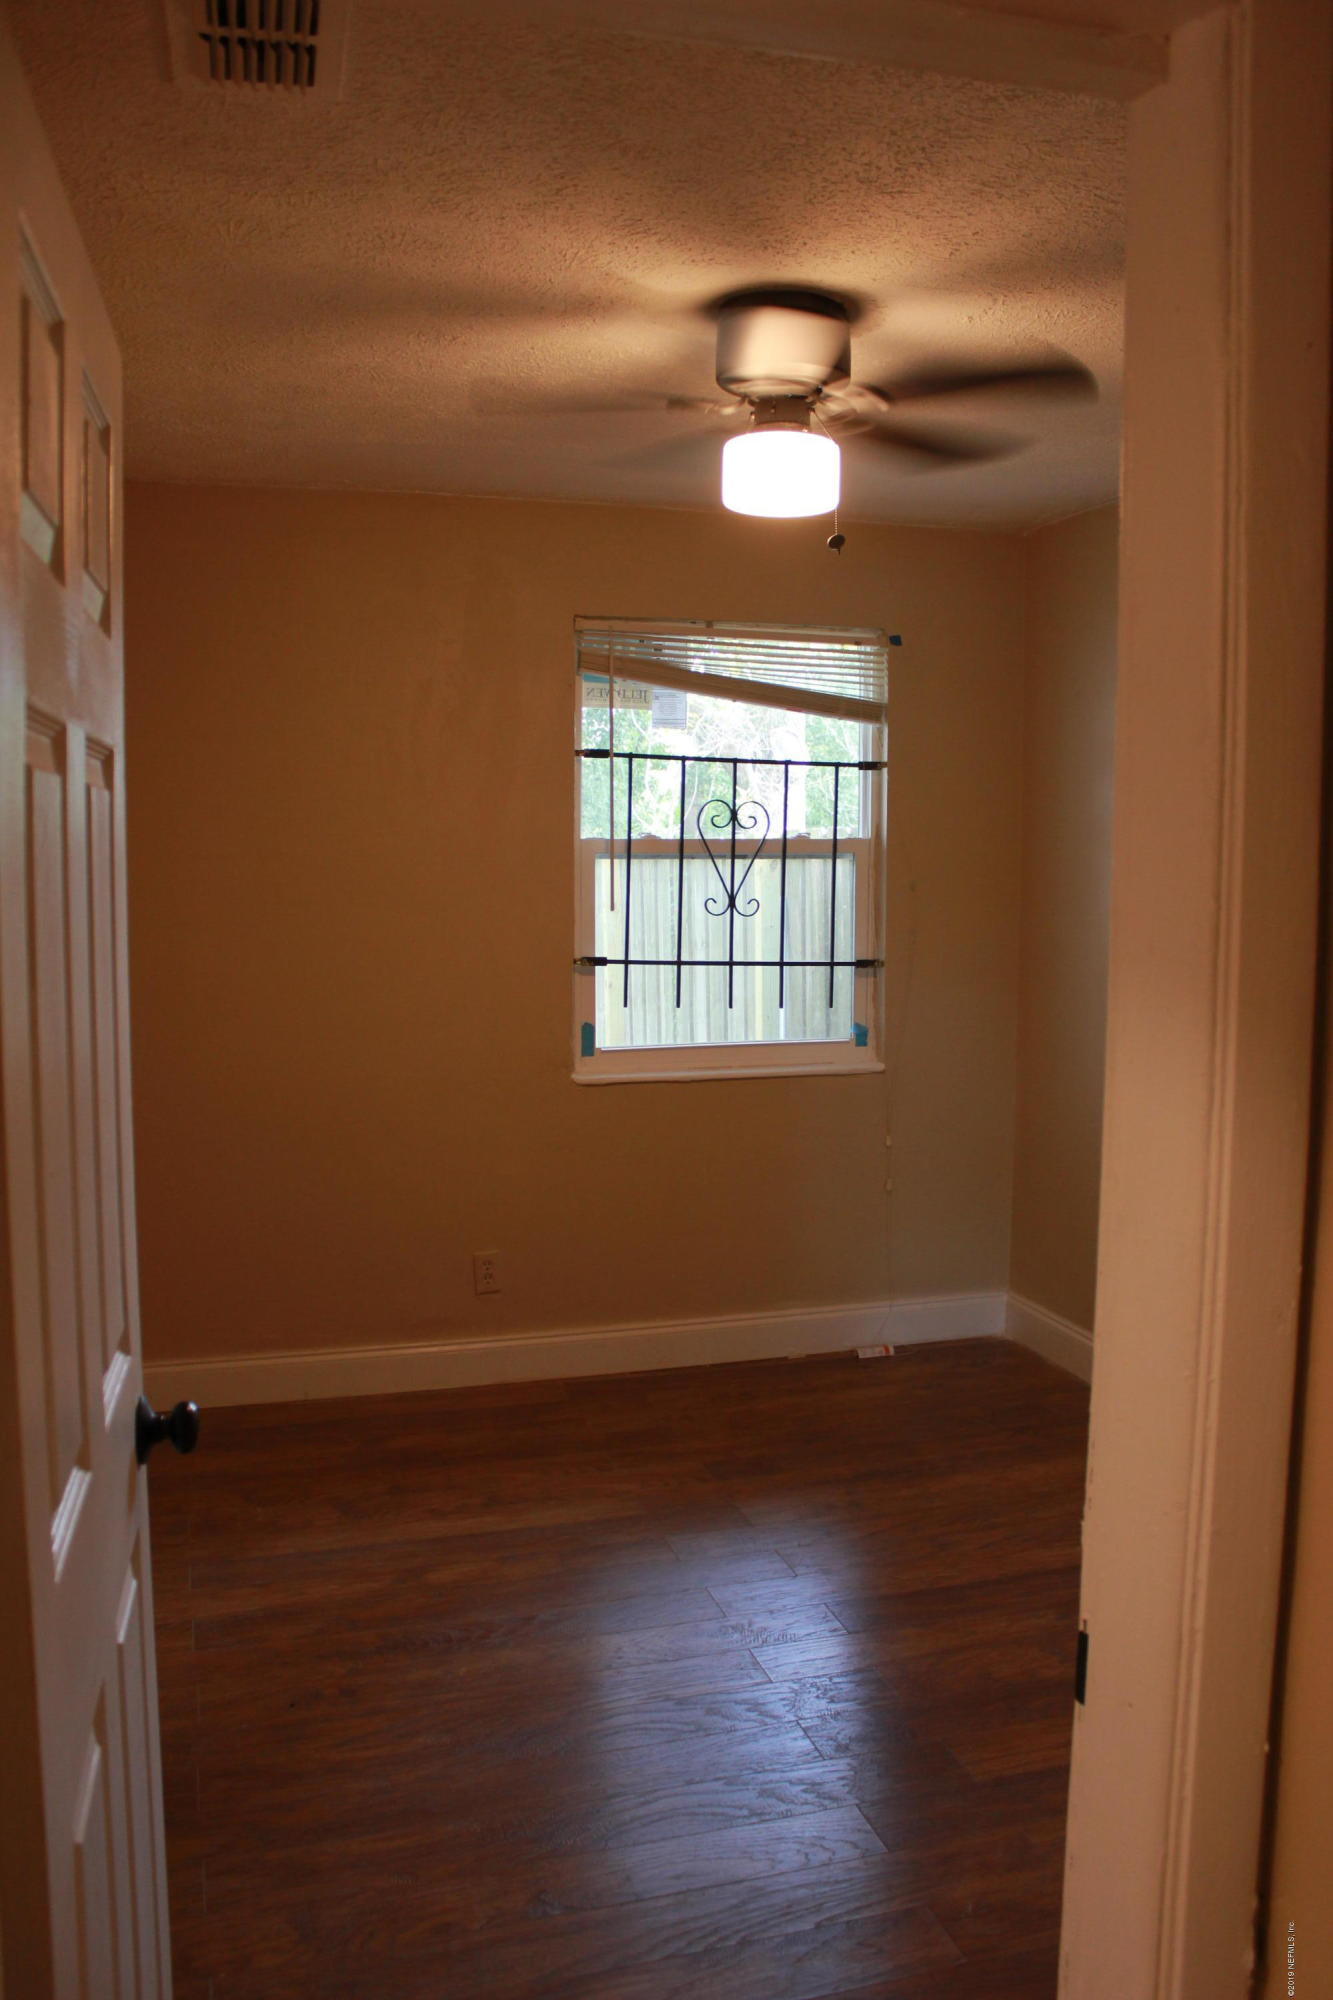 4417 KEN KNIGHT, JACKSONVILLE, FLORIDA 32209, 2 Bedrooms Bedrooms, ,1 BathroomBathrooms,Residential,For sale,KEN KNIGHT,1015653